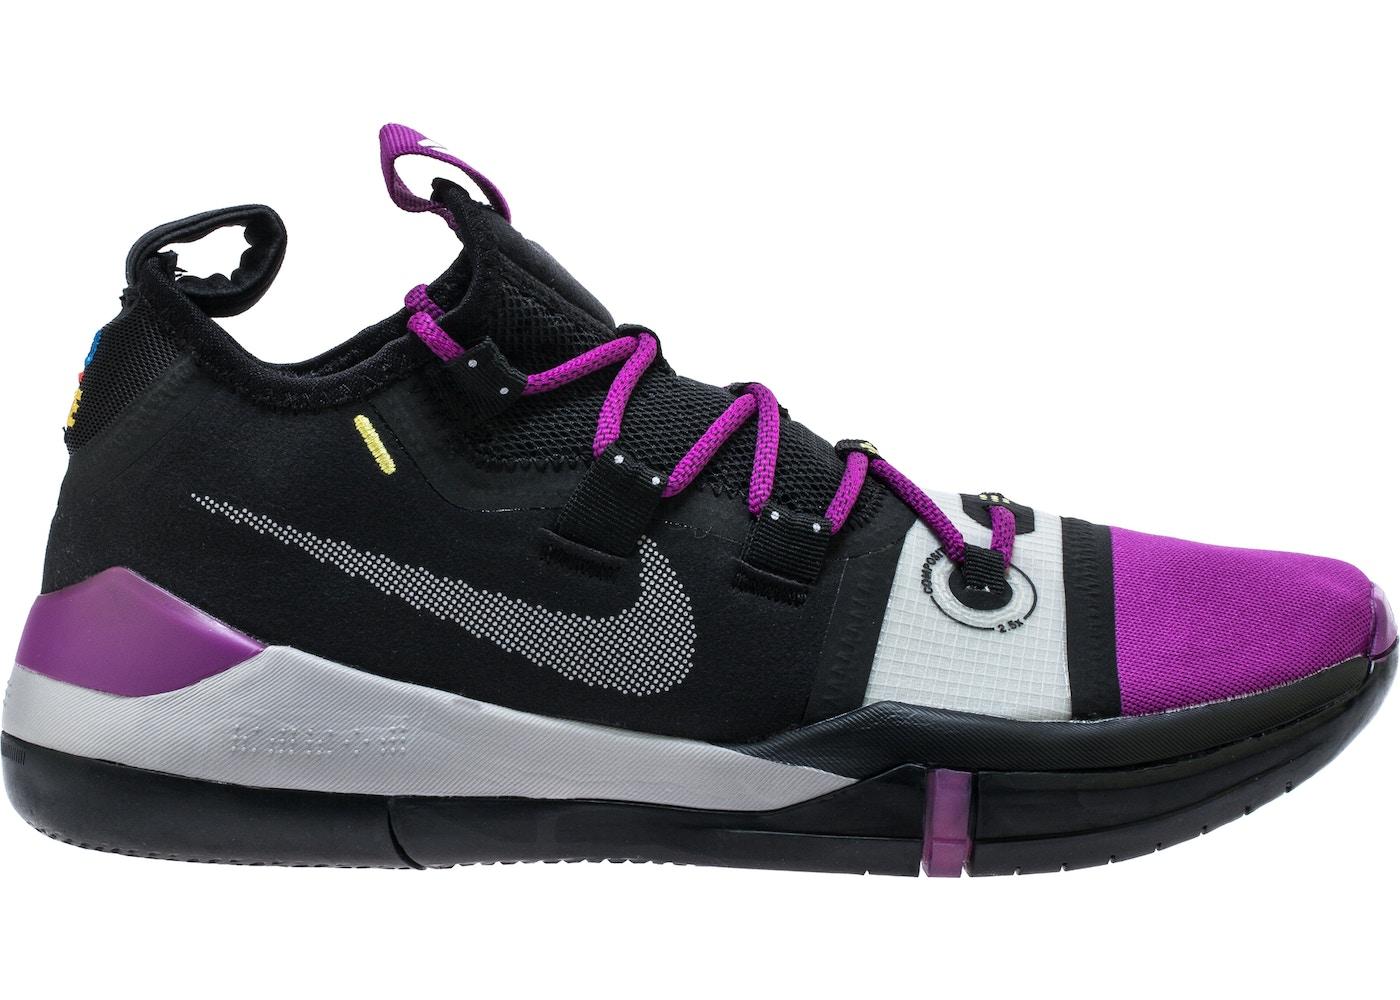 new product 0cd49 e9eb5 Kobe AD Black Purple